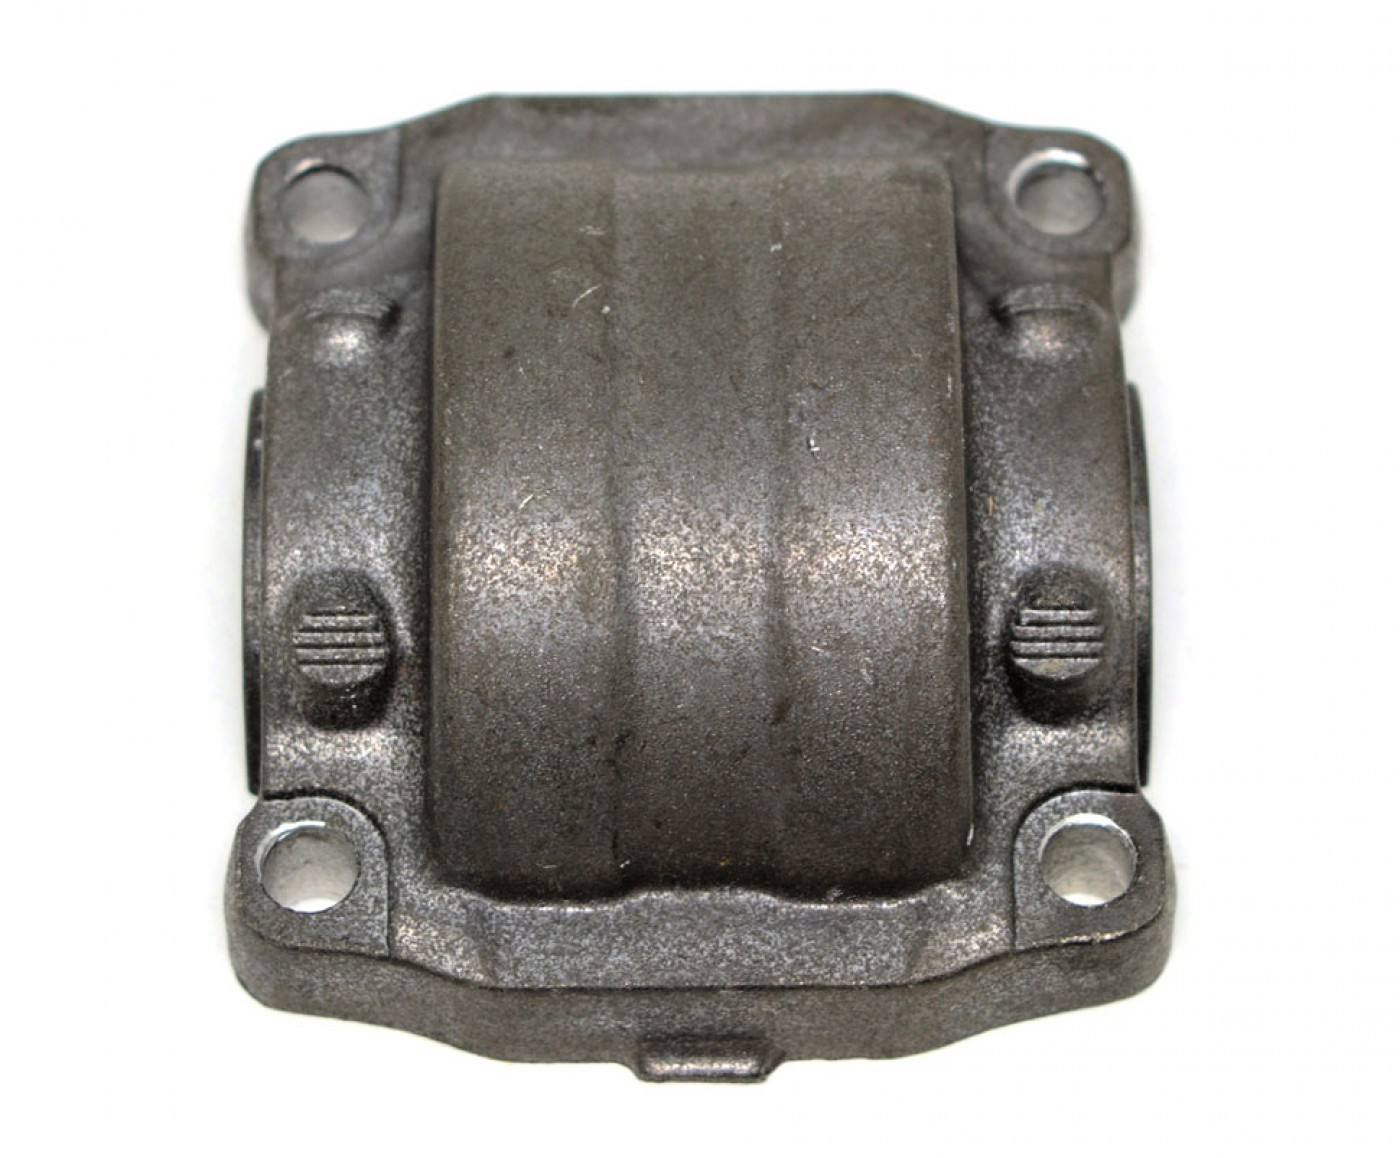 Spodný kryt motora Stihl MS171 MS181 MS211